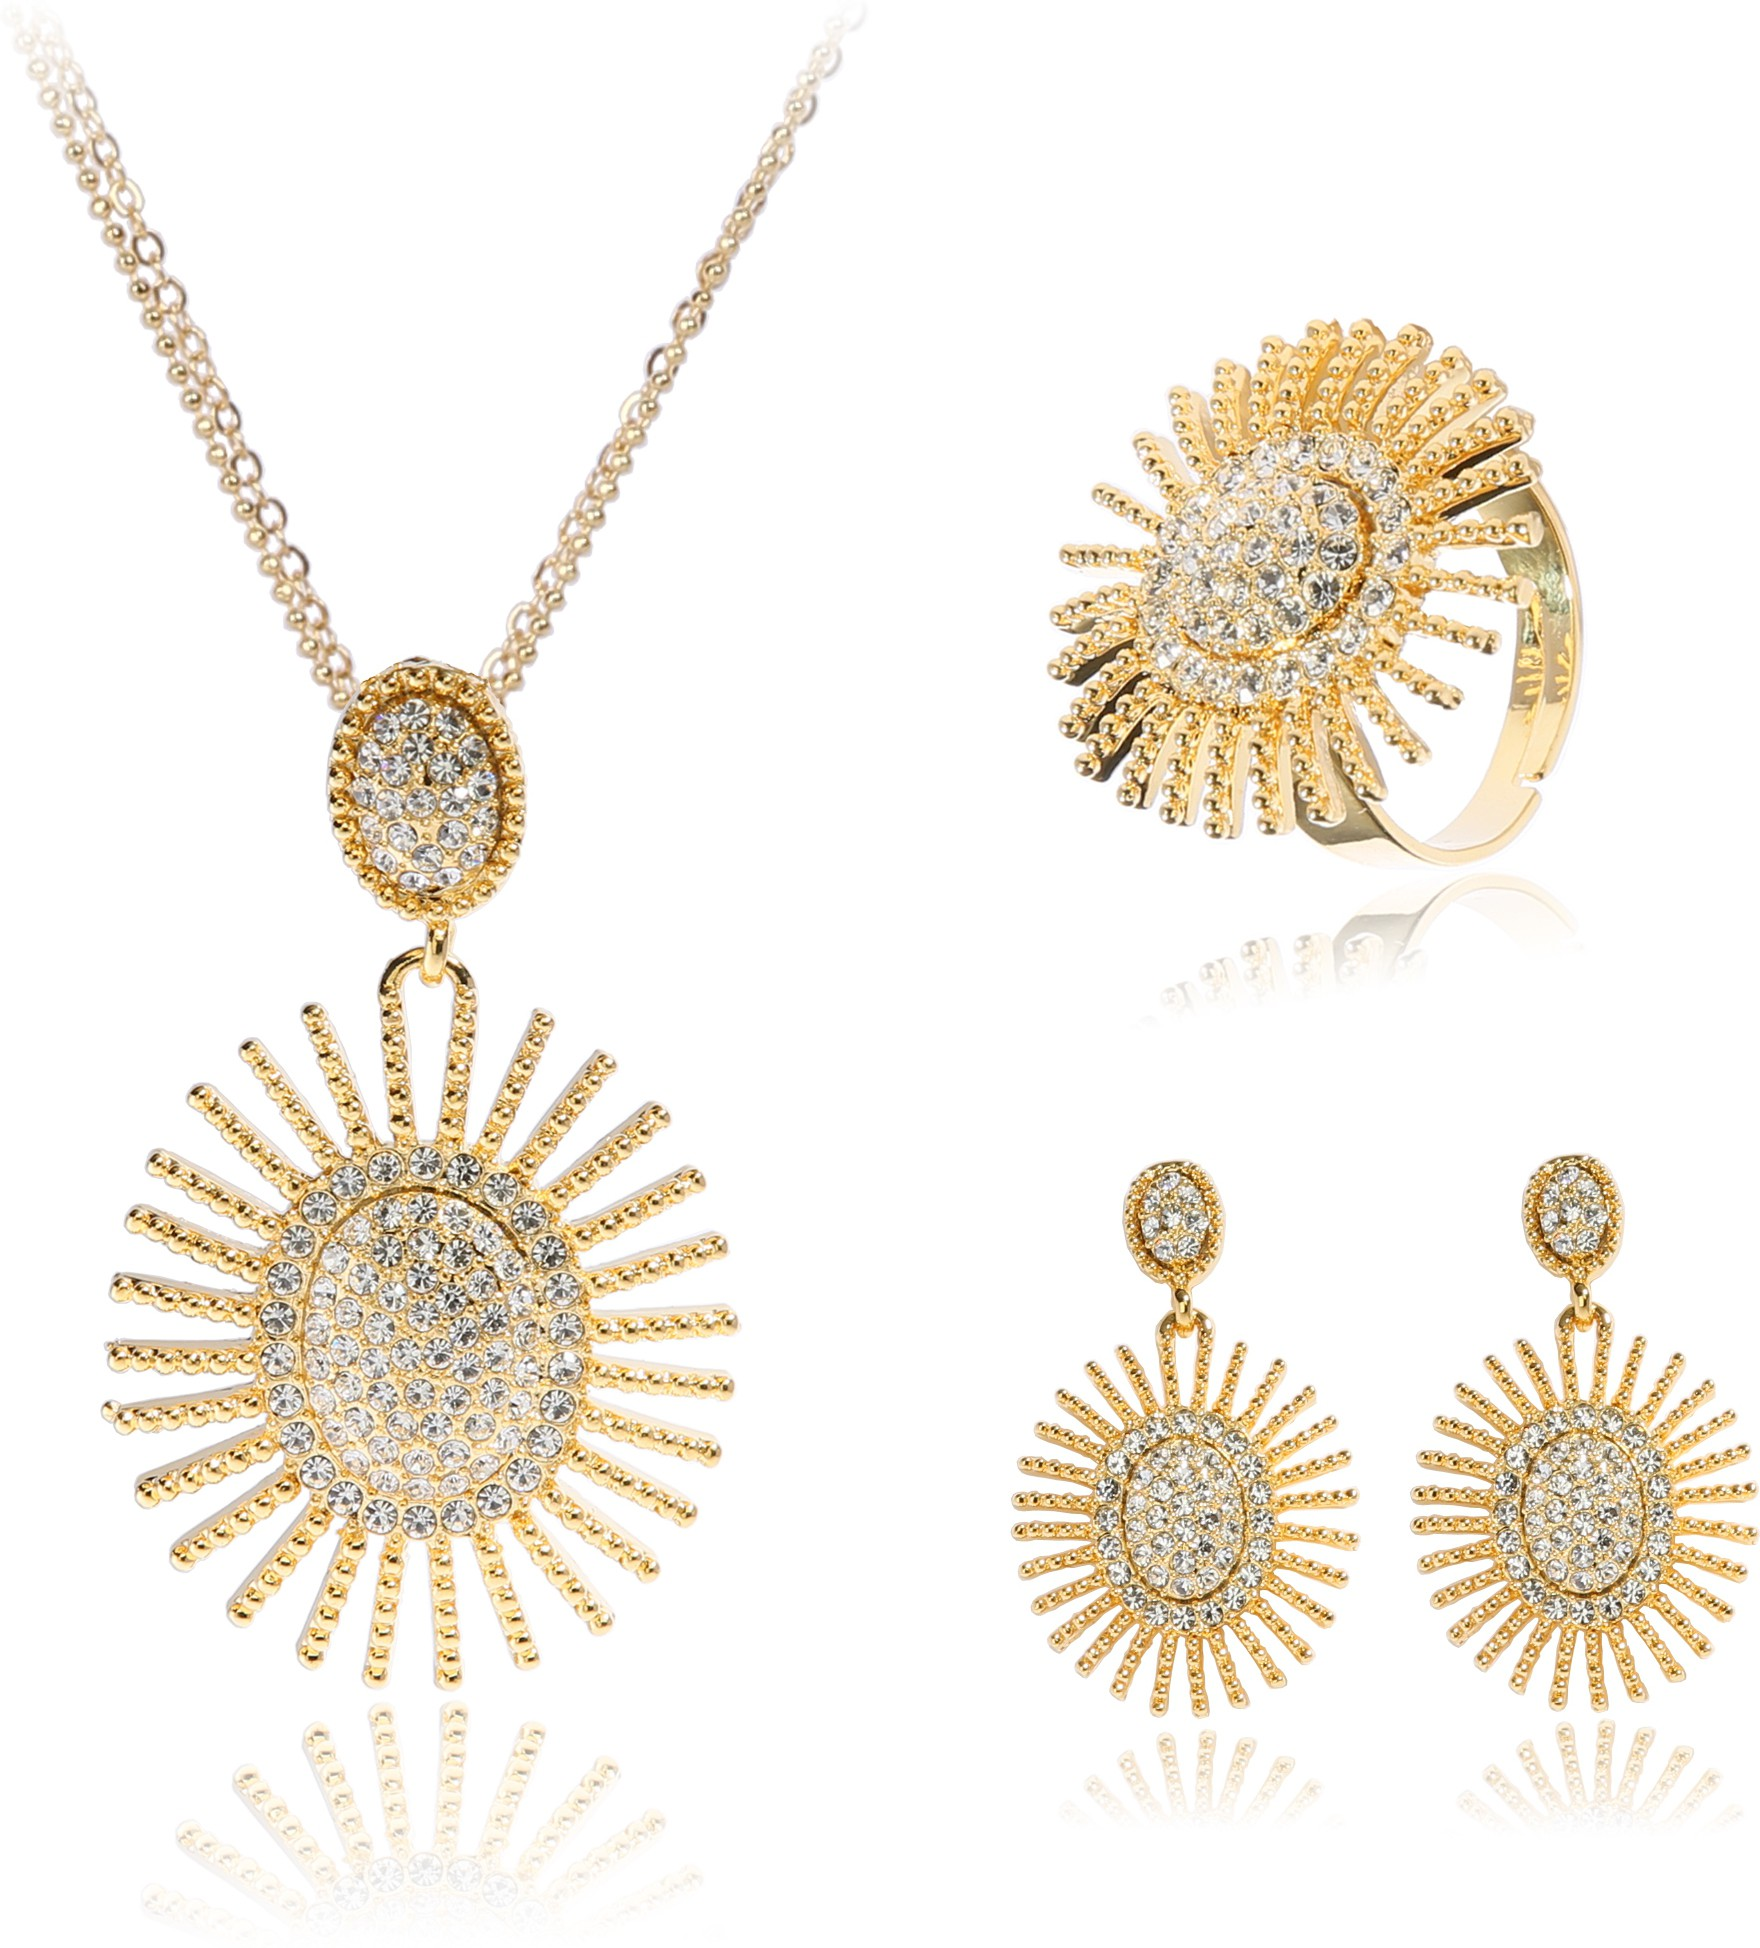 Deals - Delhi - SJ Jewellery <br> Necklaces, Jewellery Sets...<br> Category - jewellery<br> Business - Flipkart.com